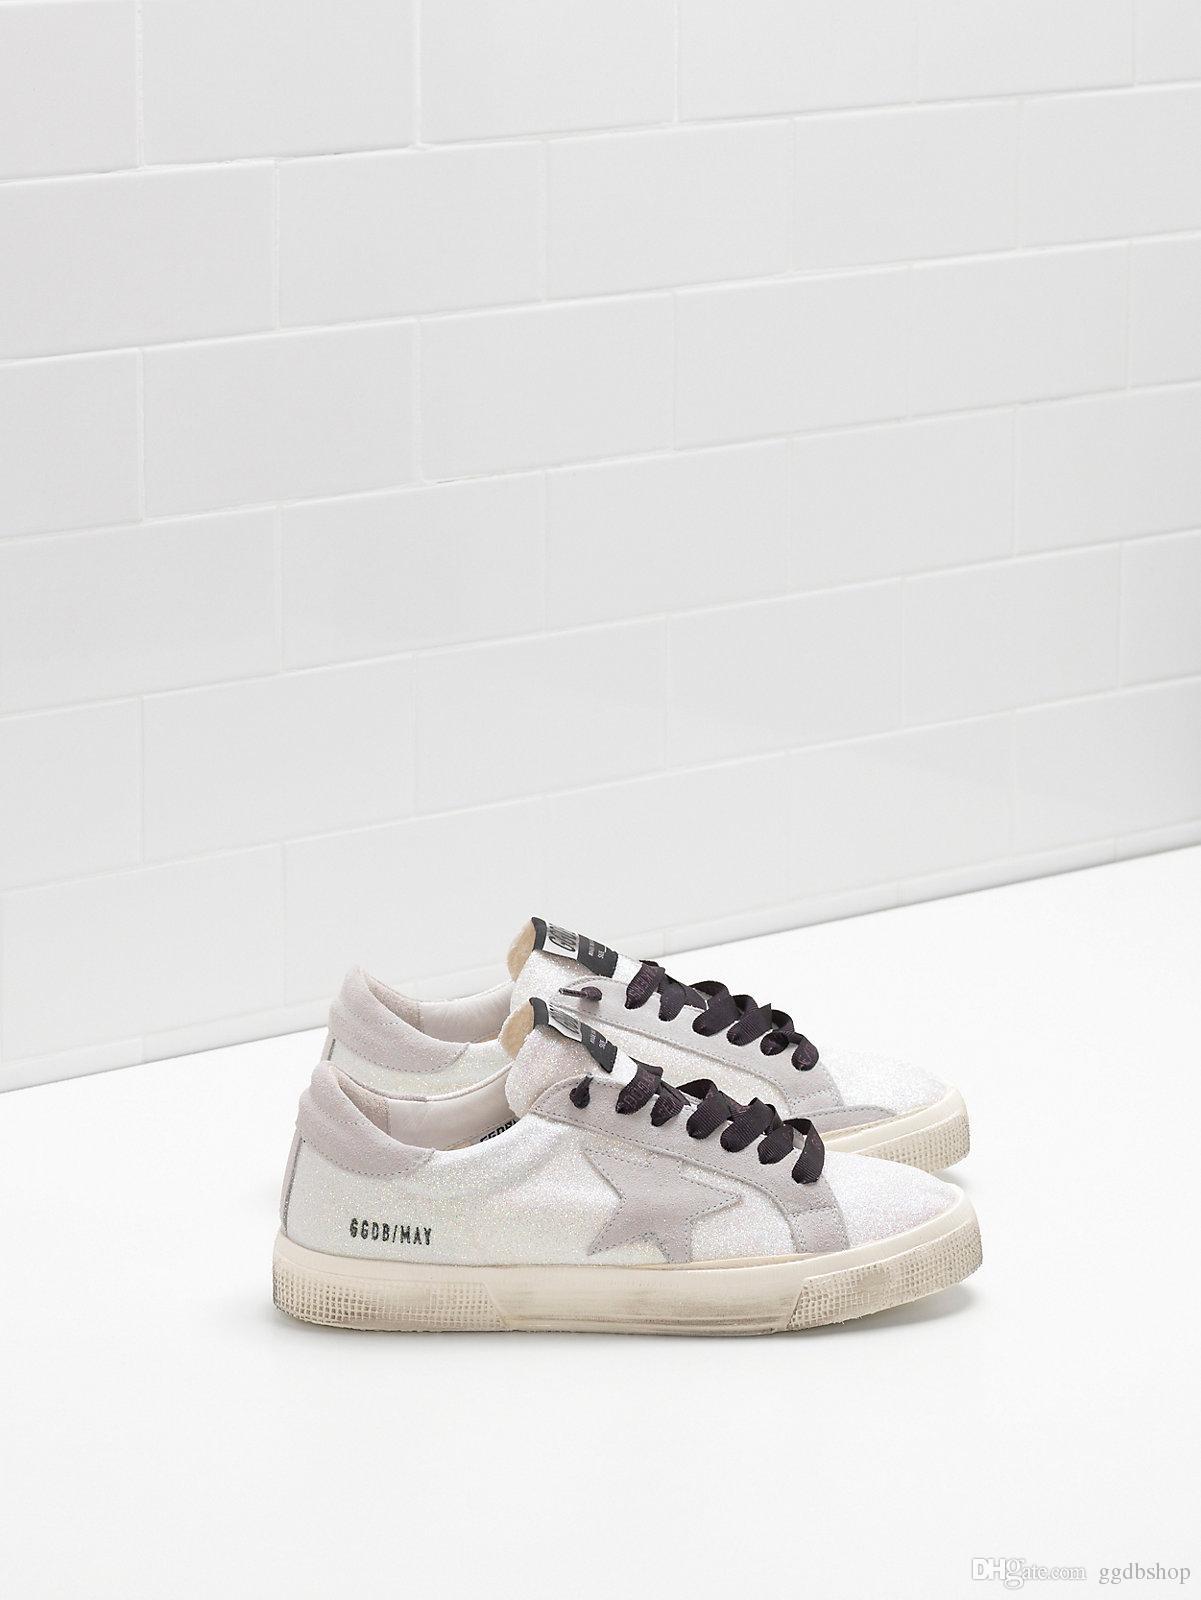 3a01403b4872 Italy Women Sneakers Shoes Saldi Scontate Men Scarpe Donna Uomo May ...